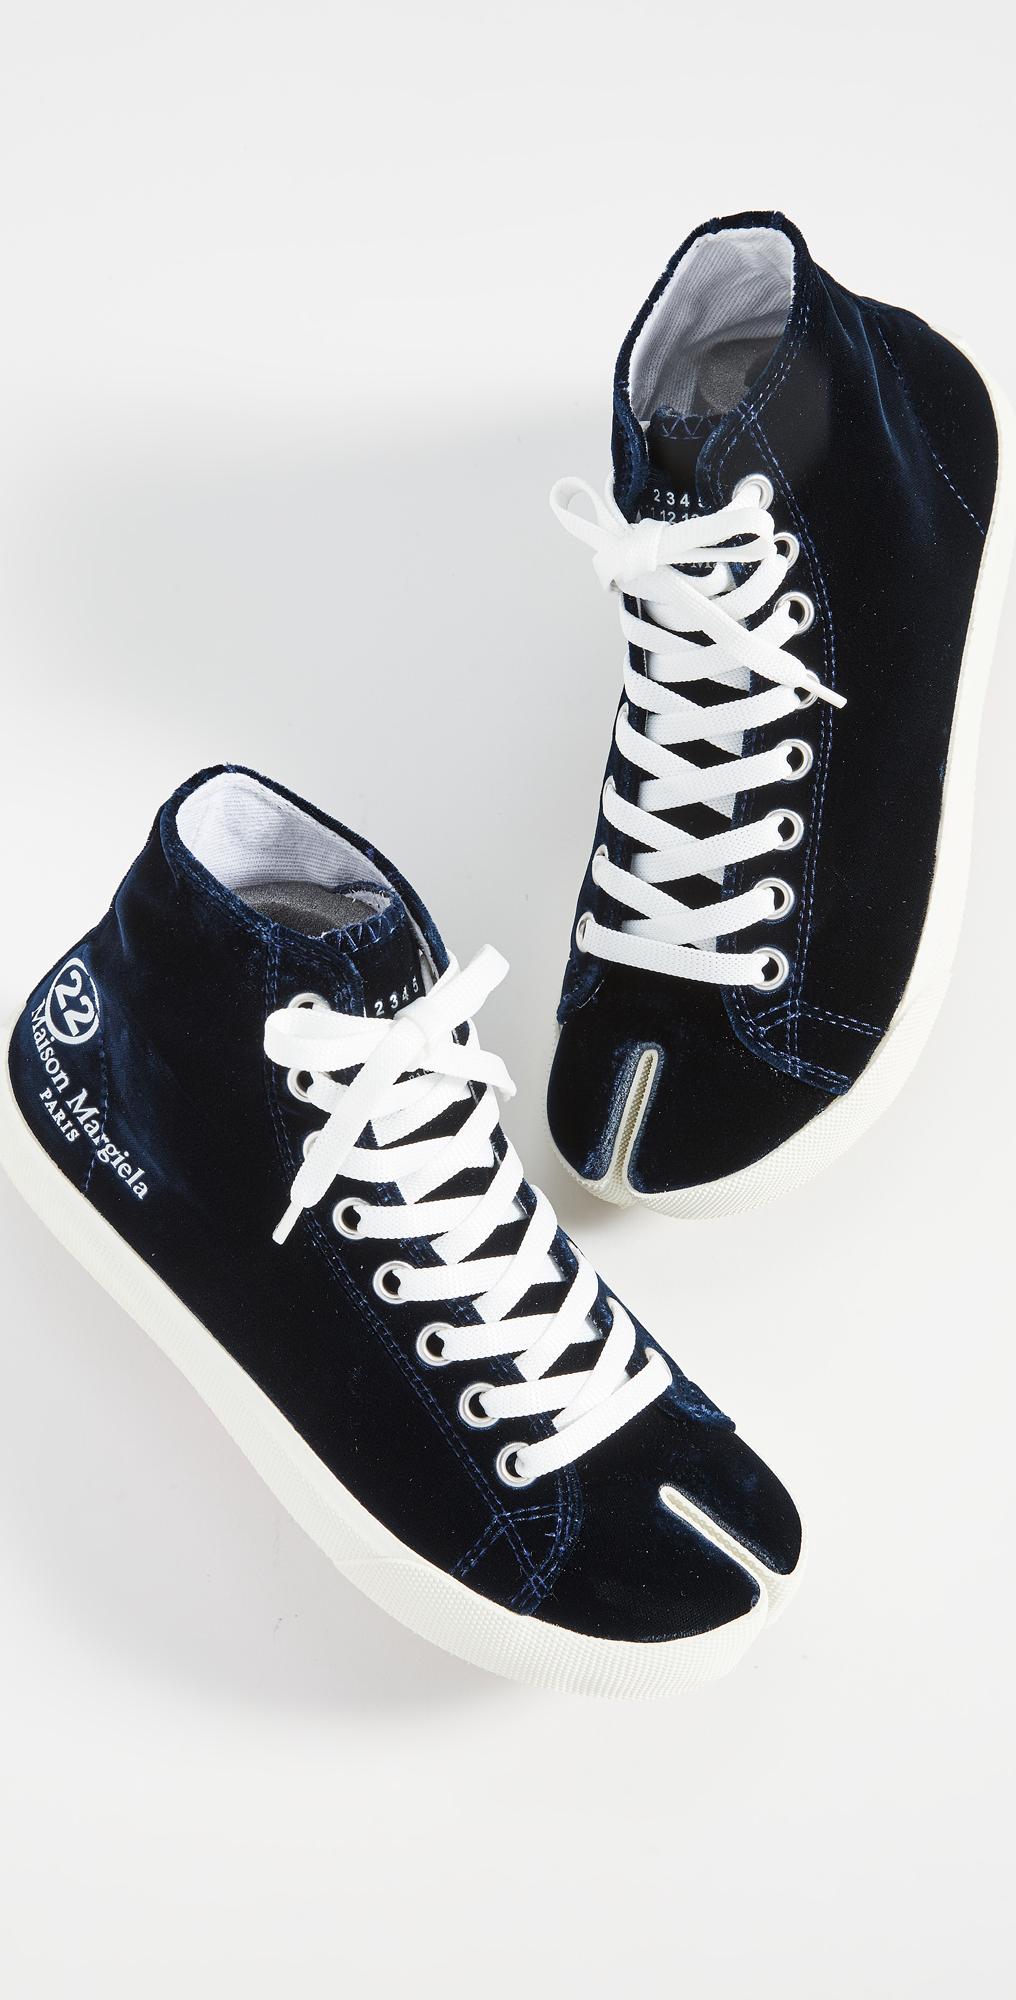 tabi high top sneakers